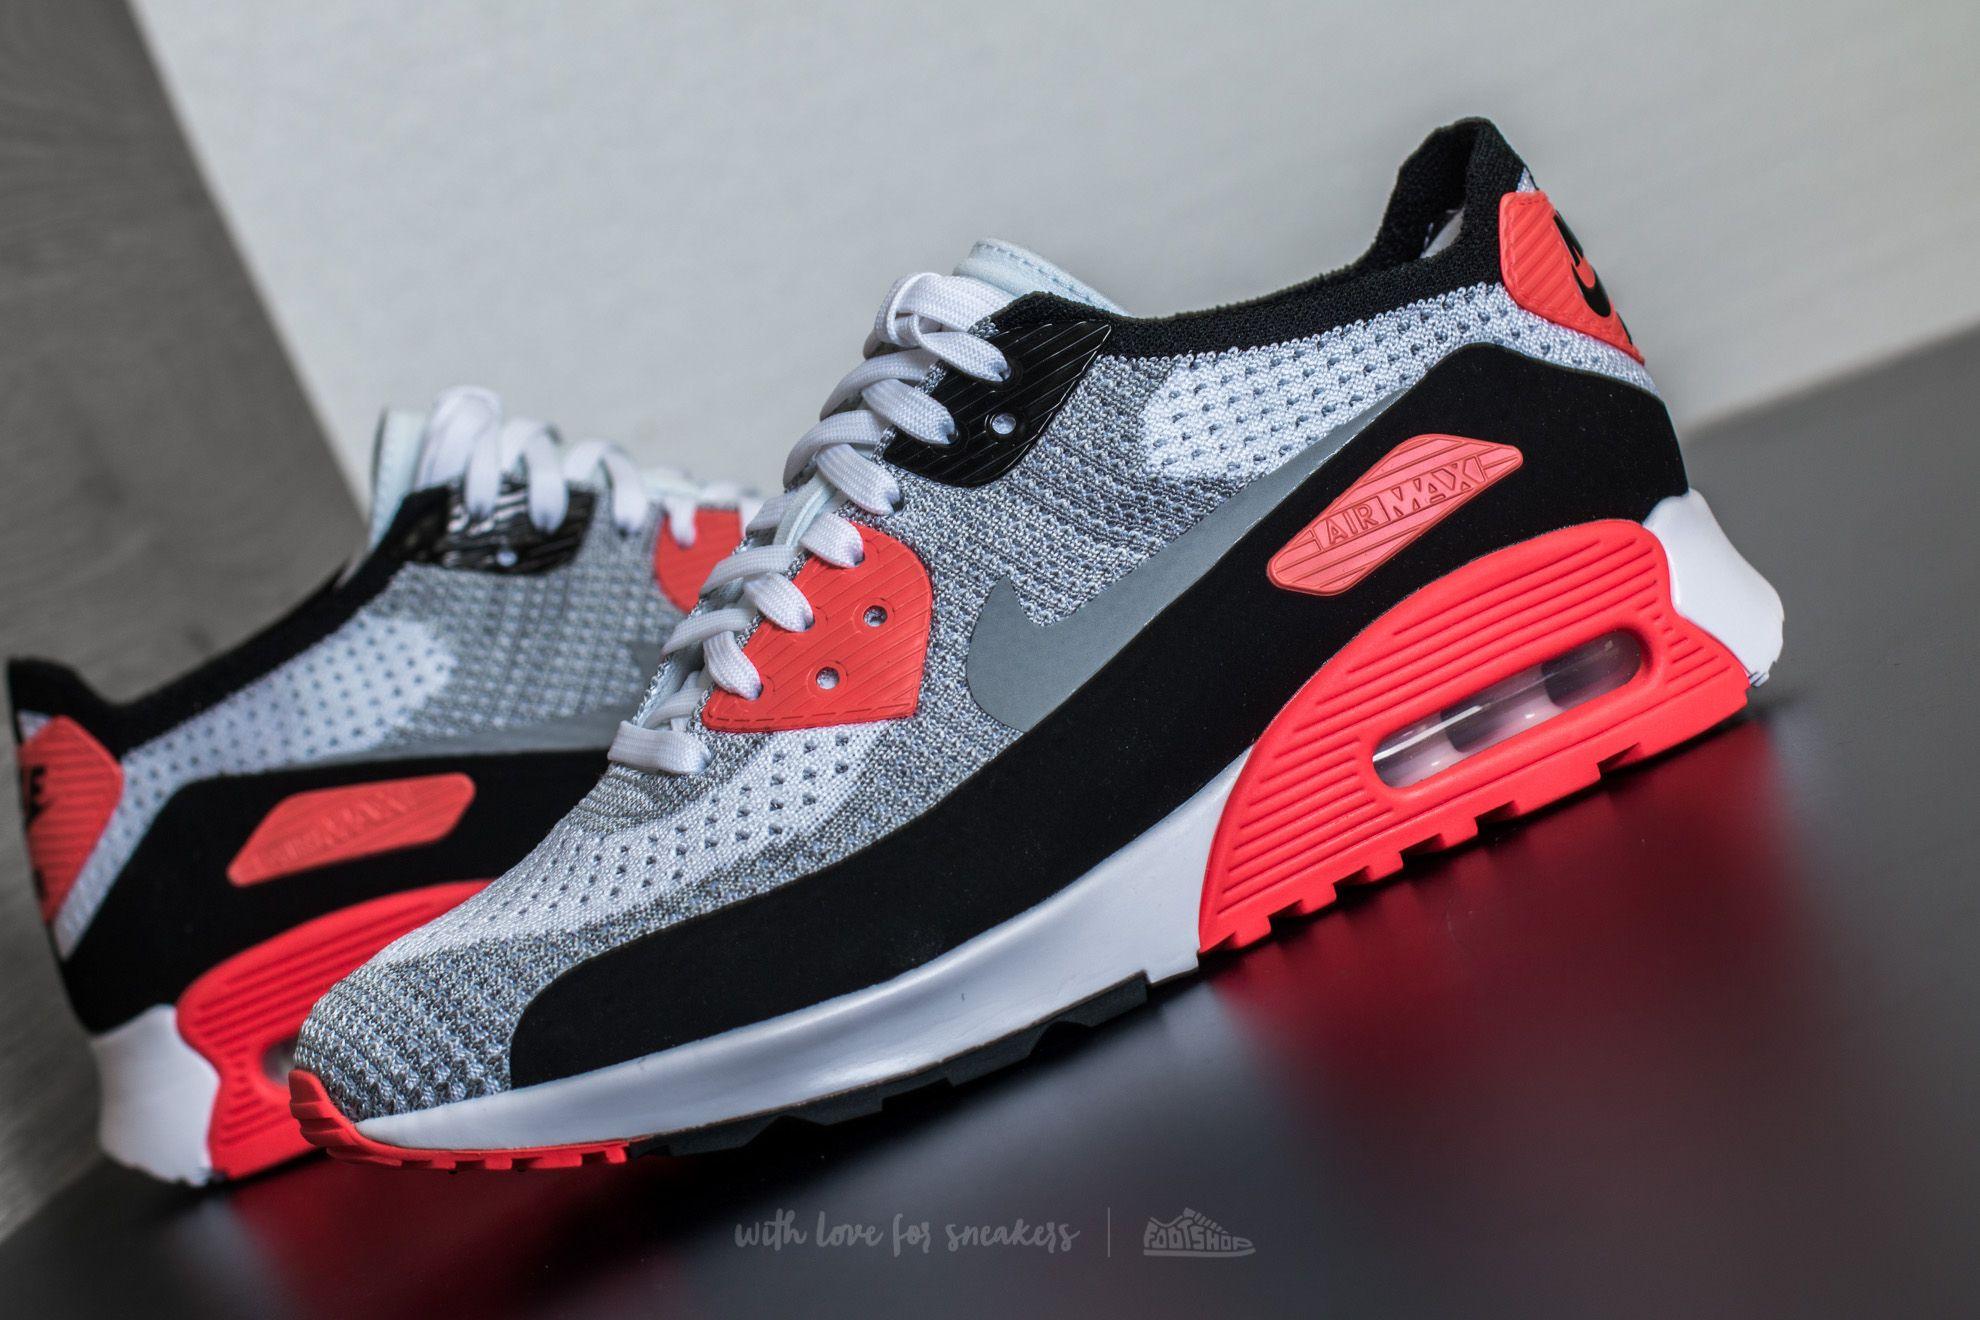 Nike Air Max 90 Ultra 2.0 Flyknit Black Bright Crimson | Footshop